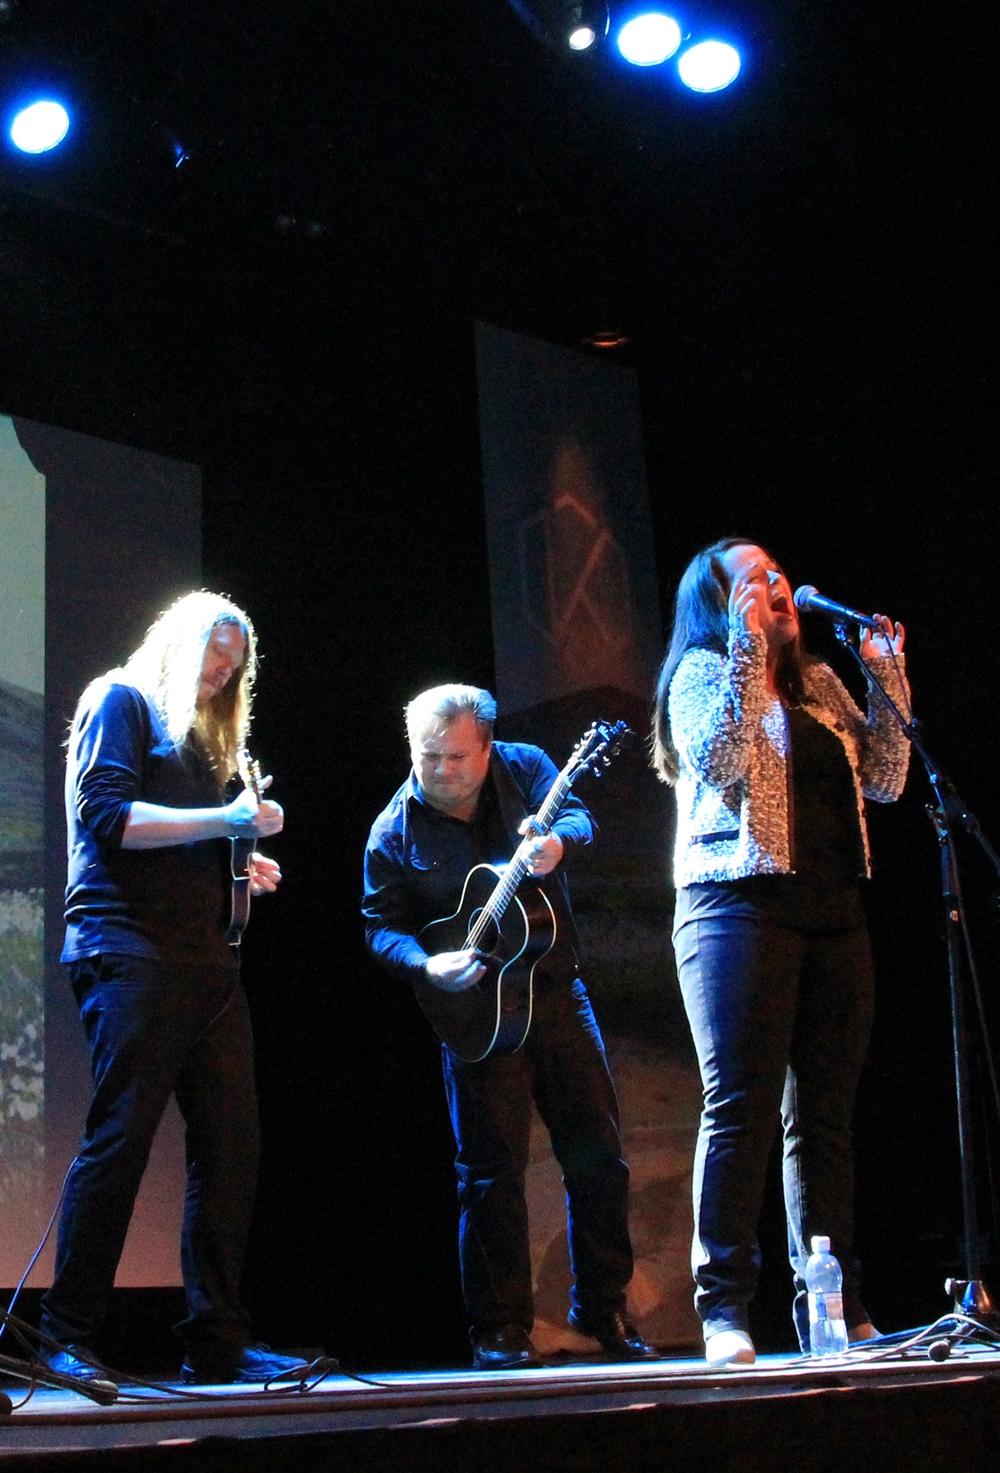 Veronica Akselsen opptrådte på Verftet (foto: Cecilie Breivik Hansen).